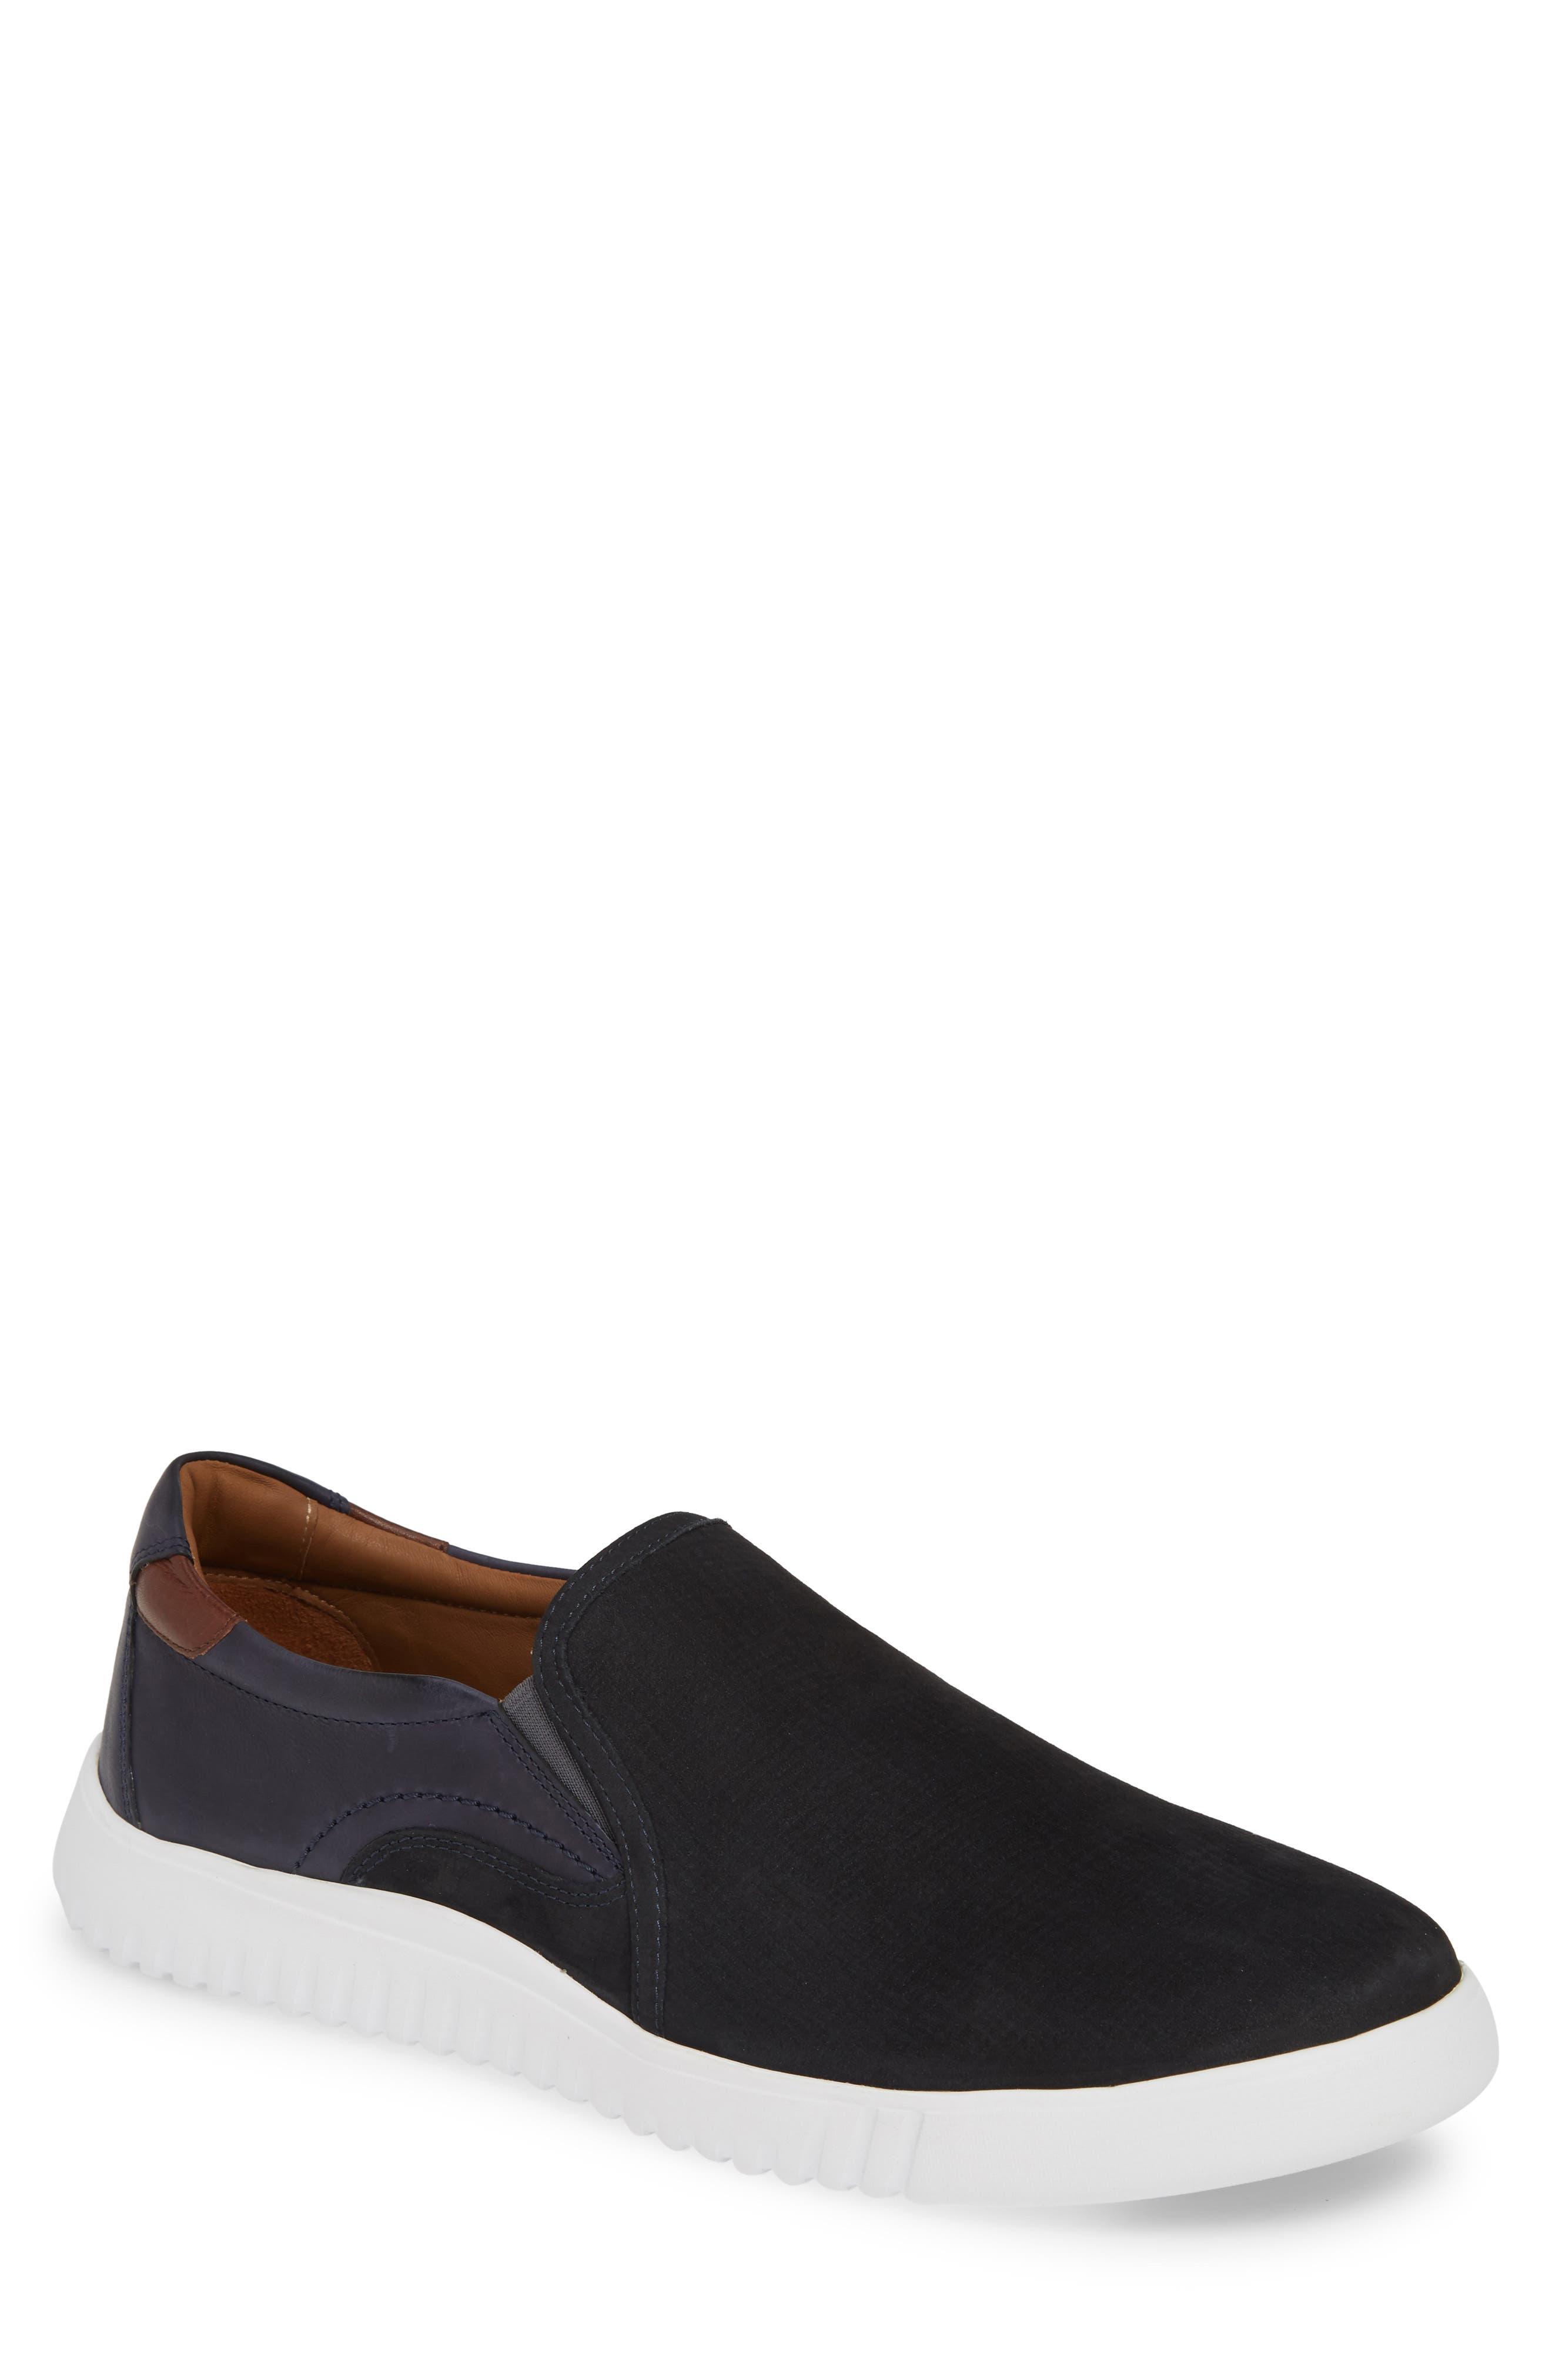 Johnston & Murphy Mcfarland Slip-On Sneaker, Blue